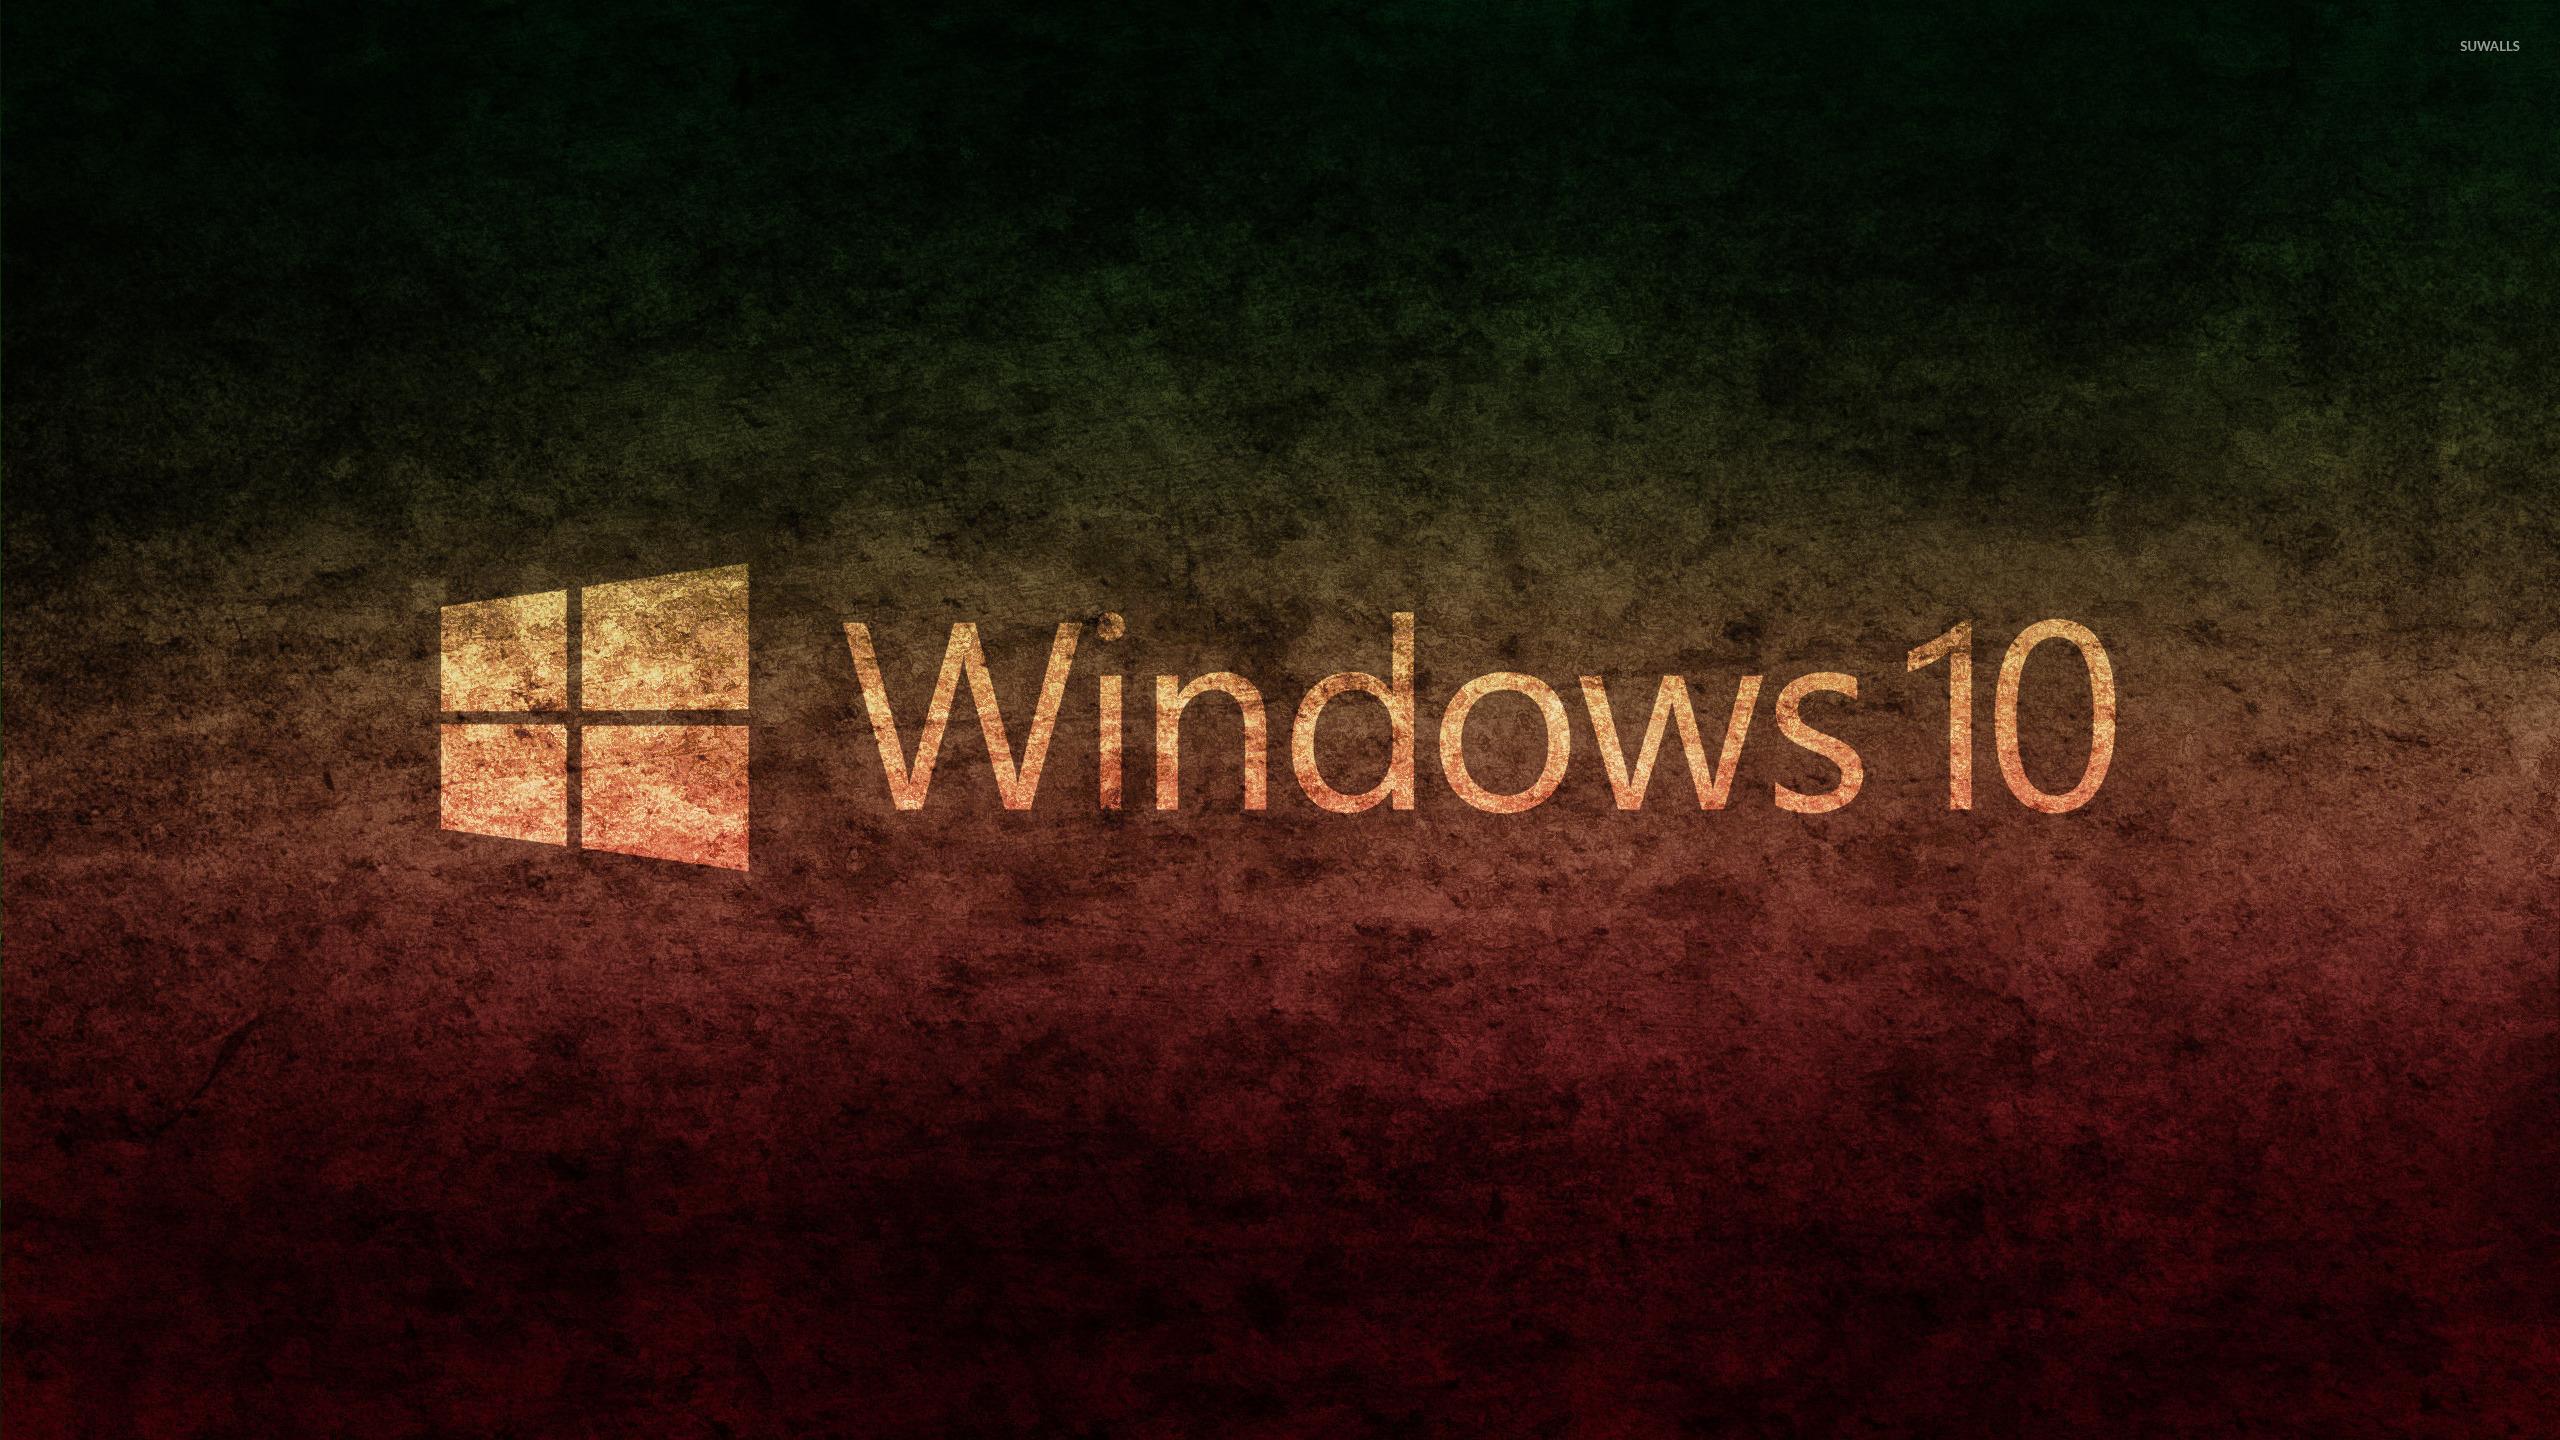 4k Laptop Wallpaper Fall Forest Windows 10 Transparent Text Logo On Concrete Wallpaper